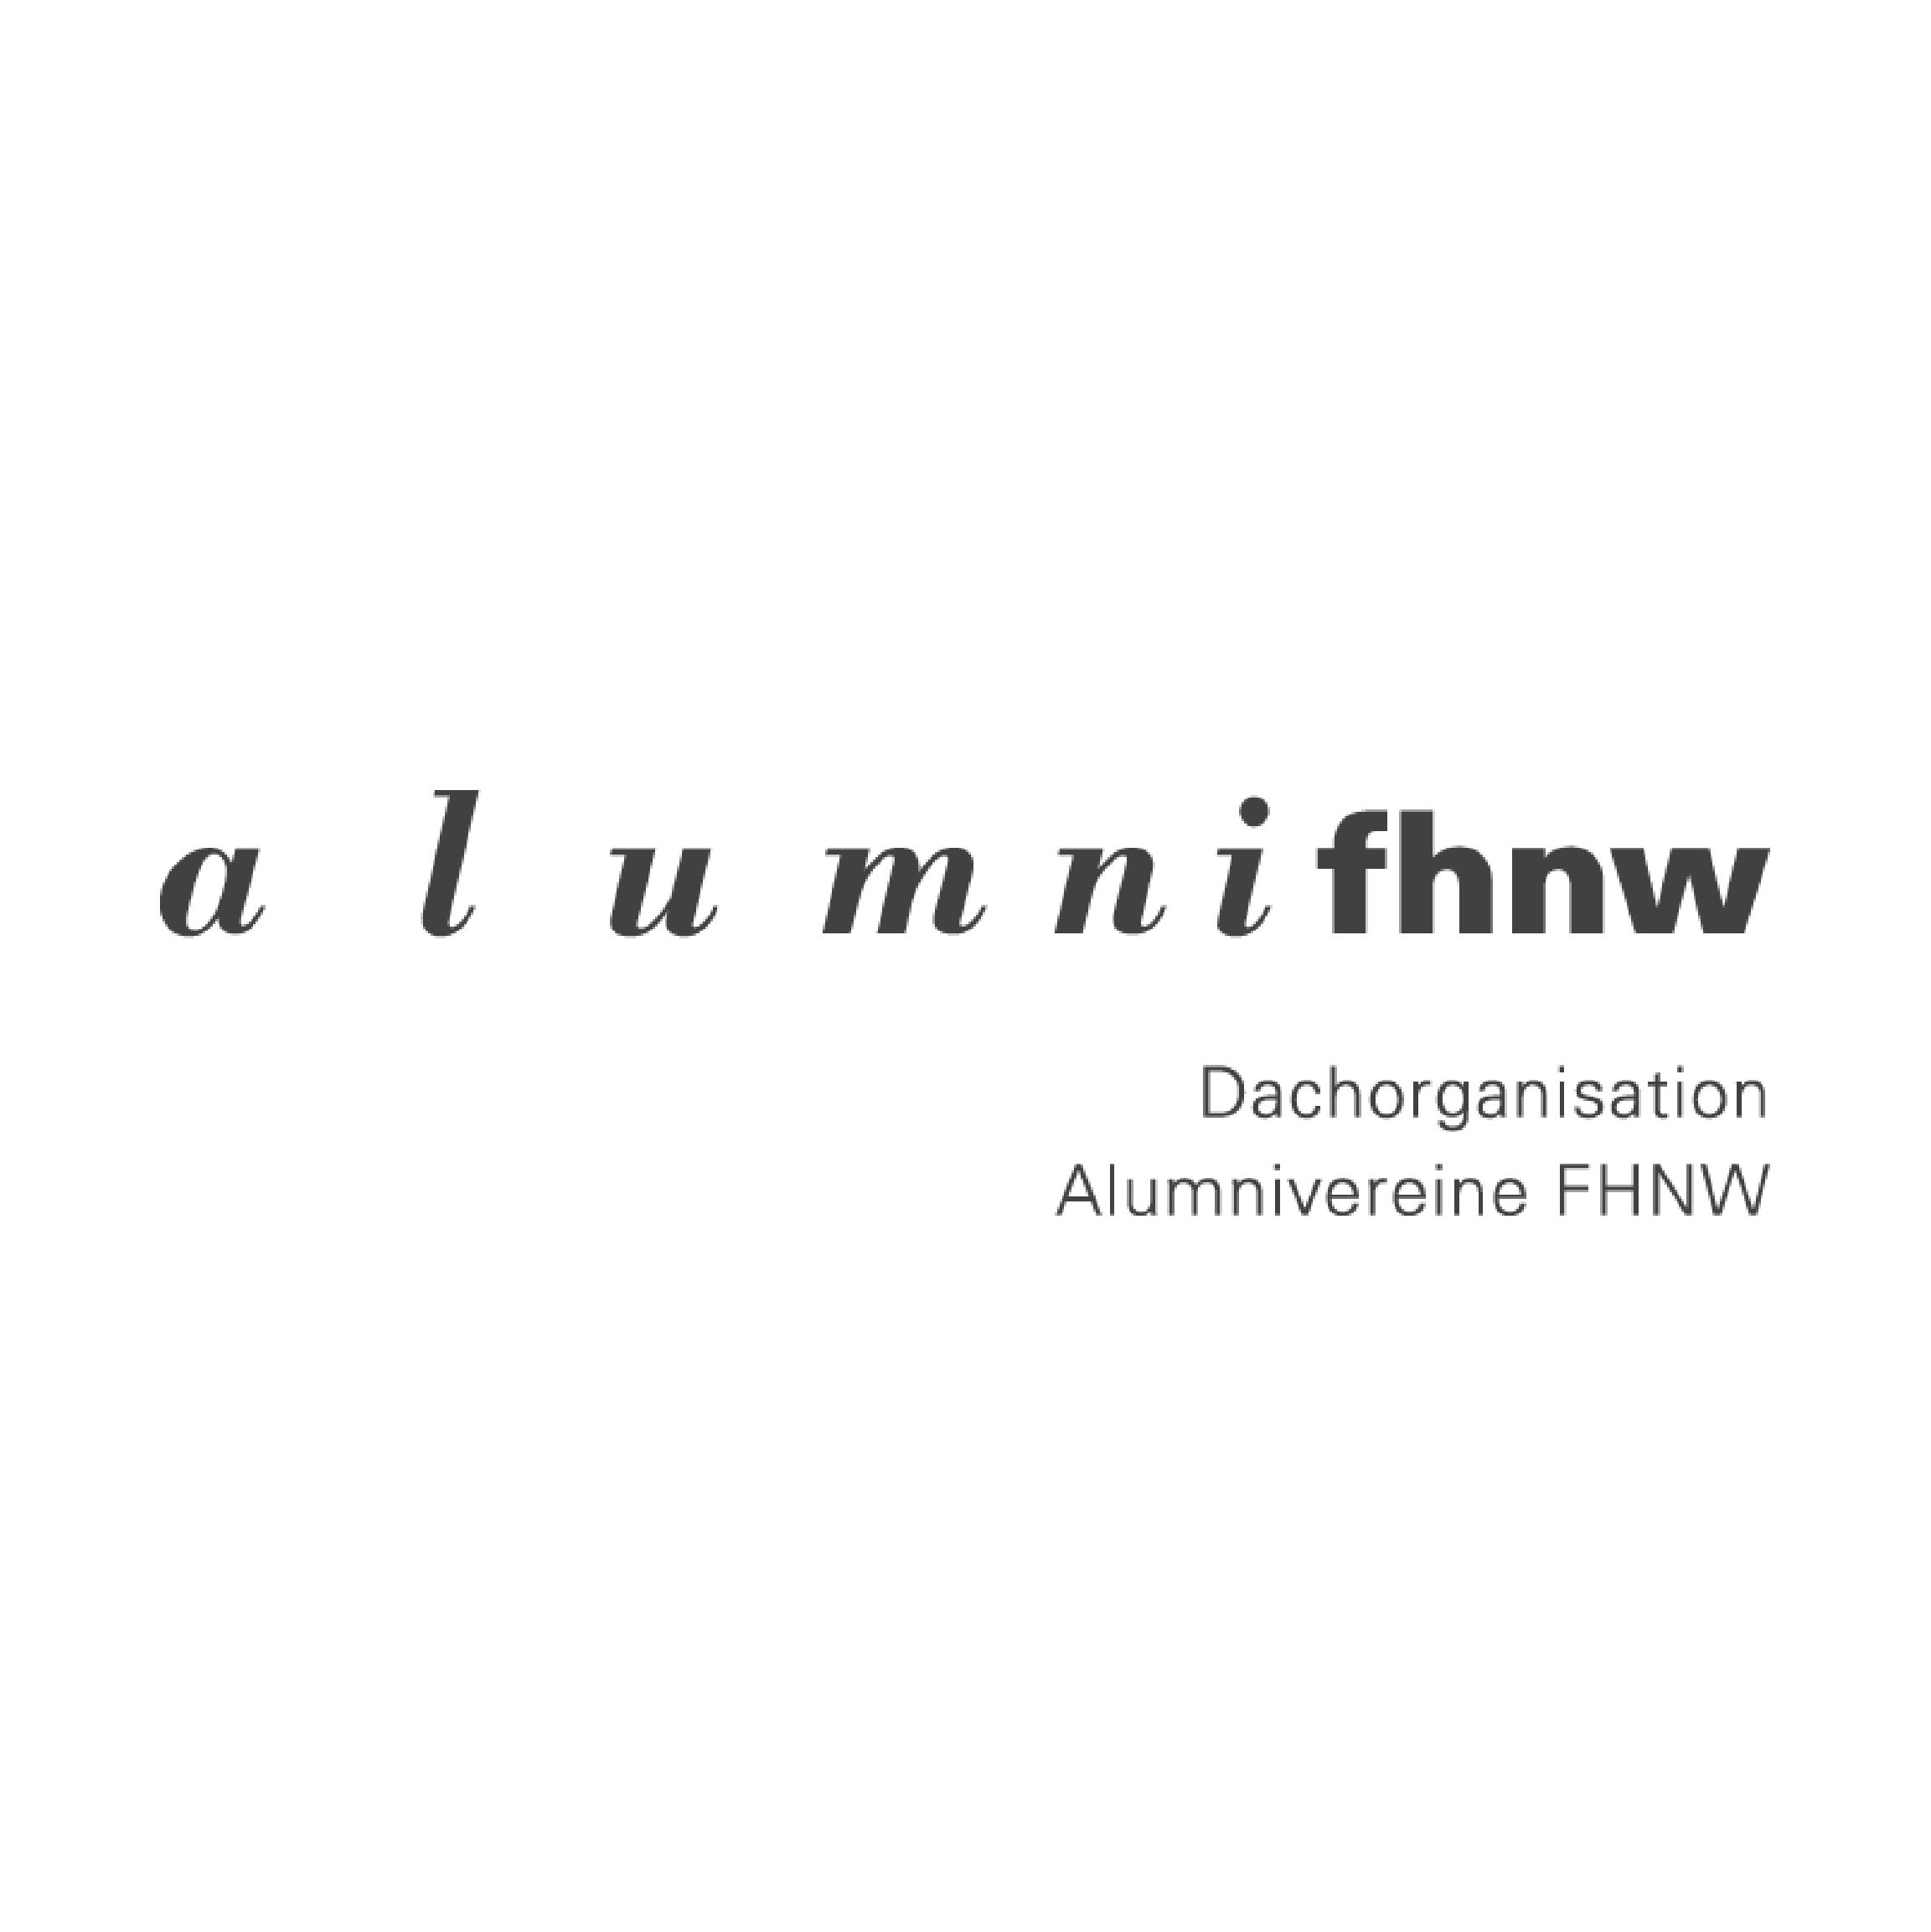 alumniFHNW